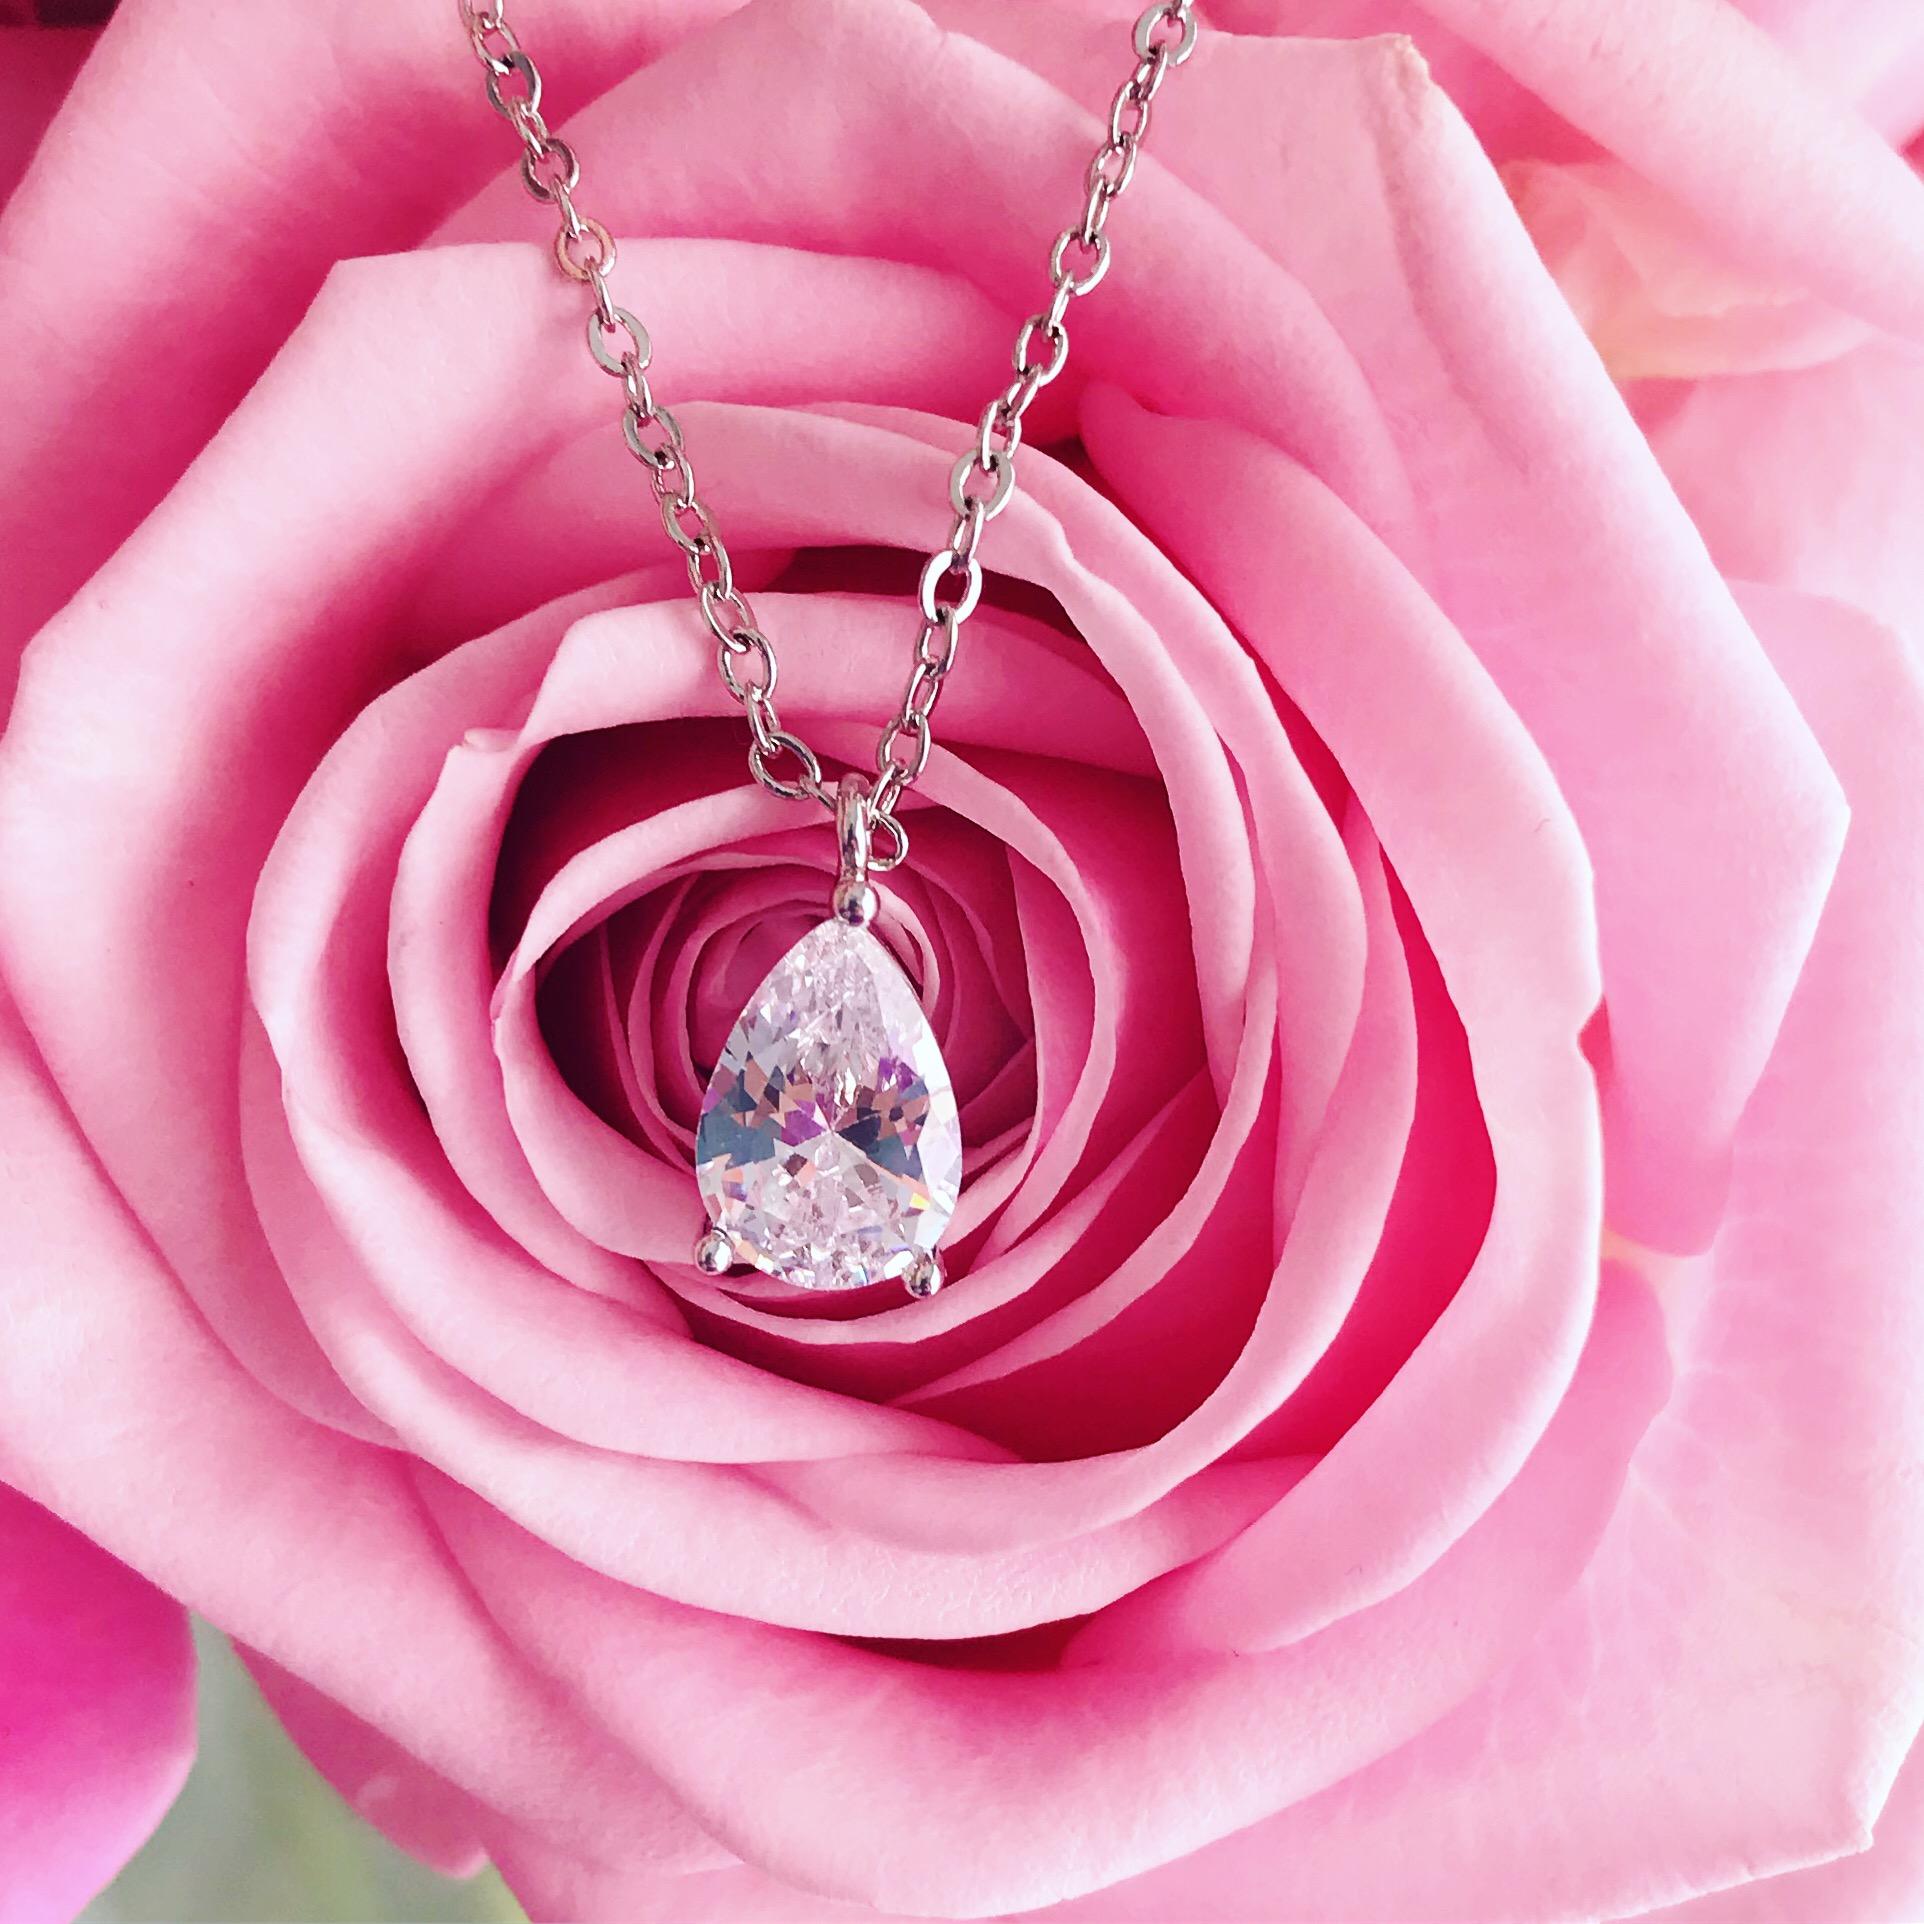 Daily luxury ketting bij roze roos